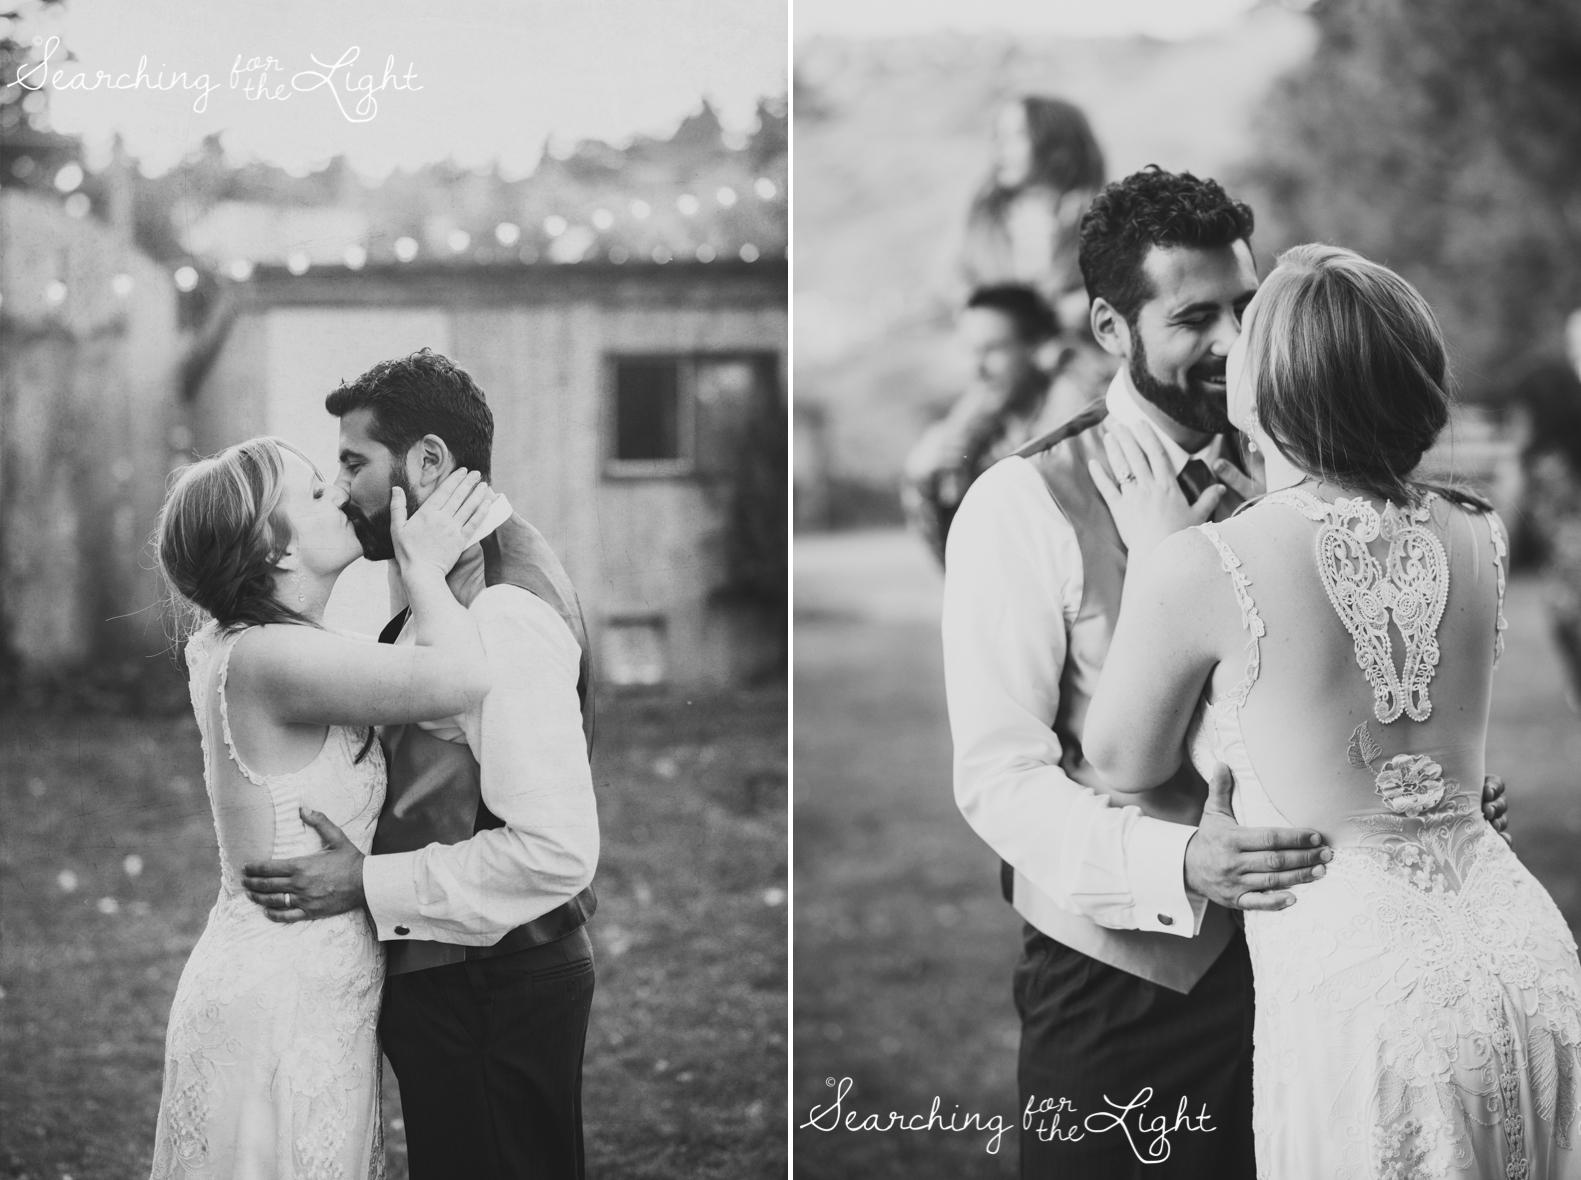 lyons farmette wedding photo, colorado wedding photographer, denver wedding photographer, bride and groom